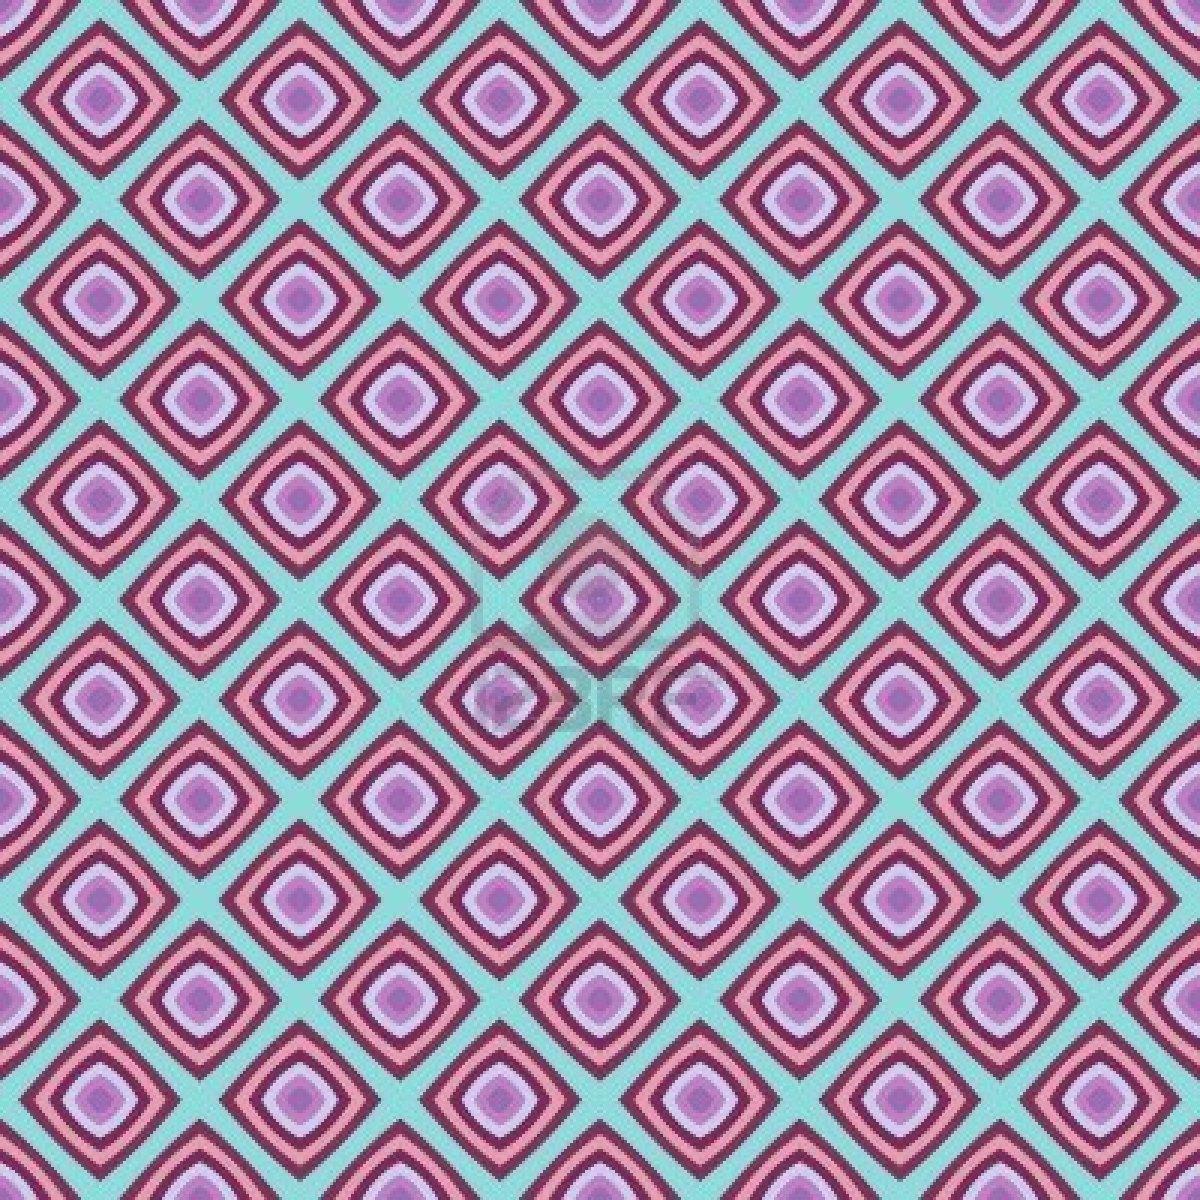 geometric design wallpapers geometric design wallpapers geometric 1200x1200